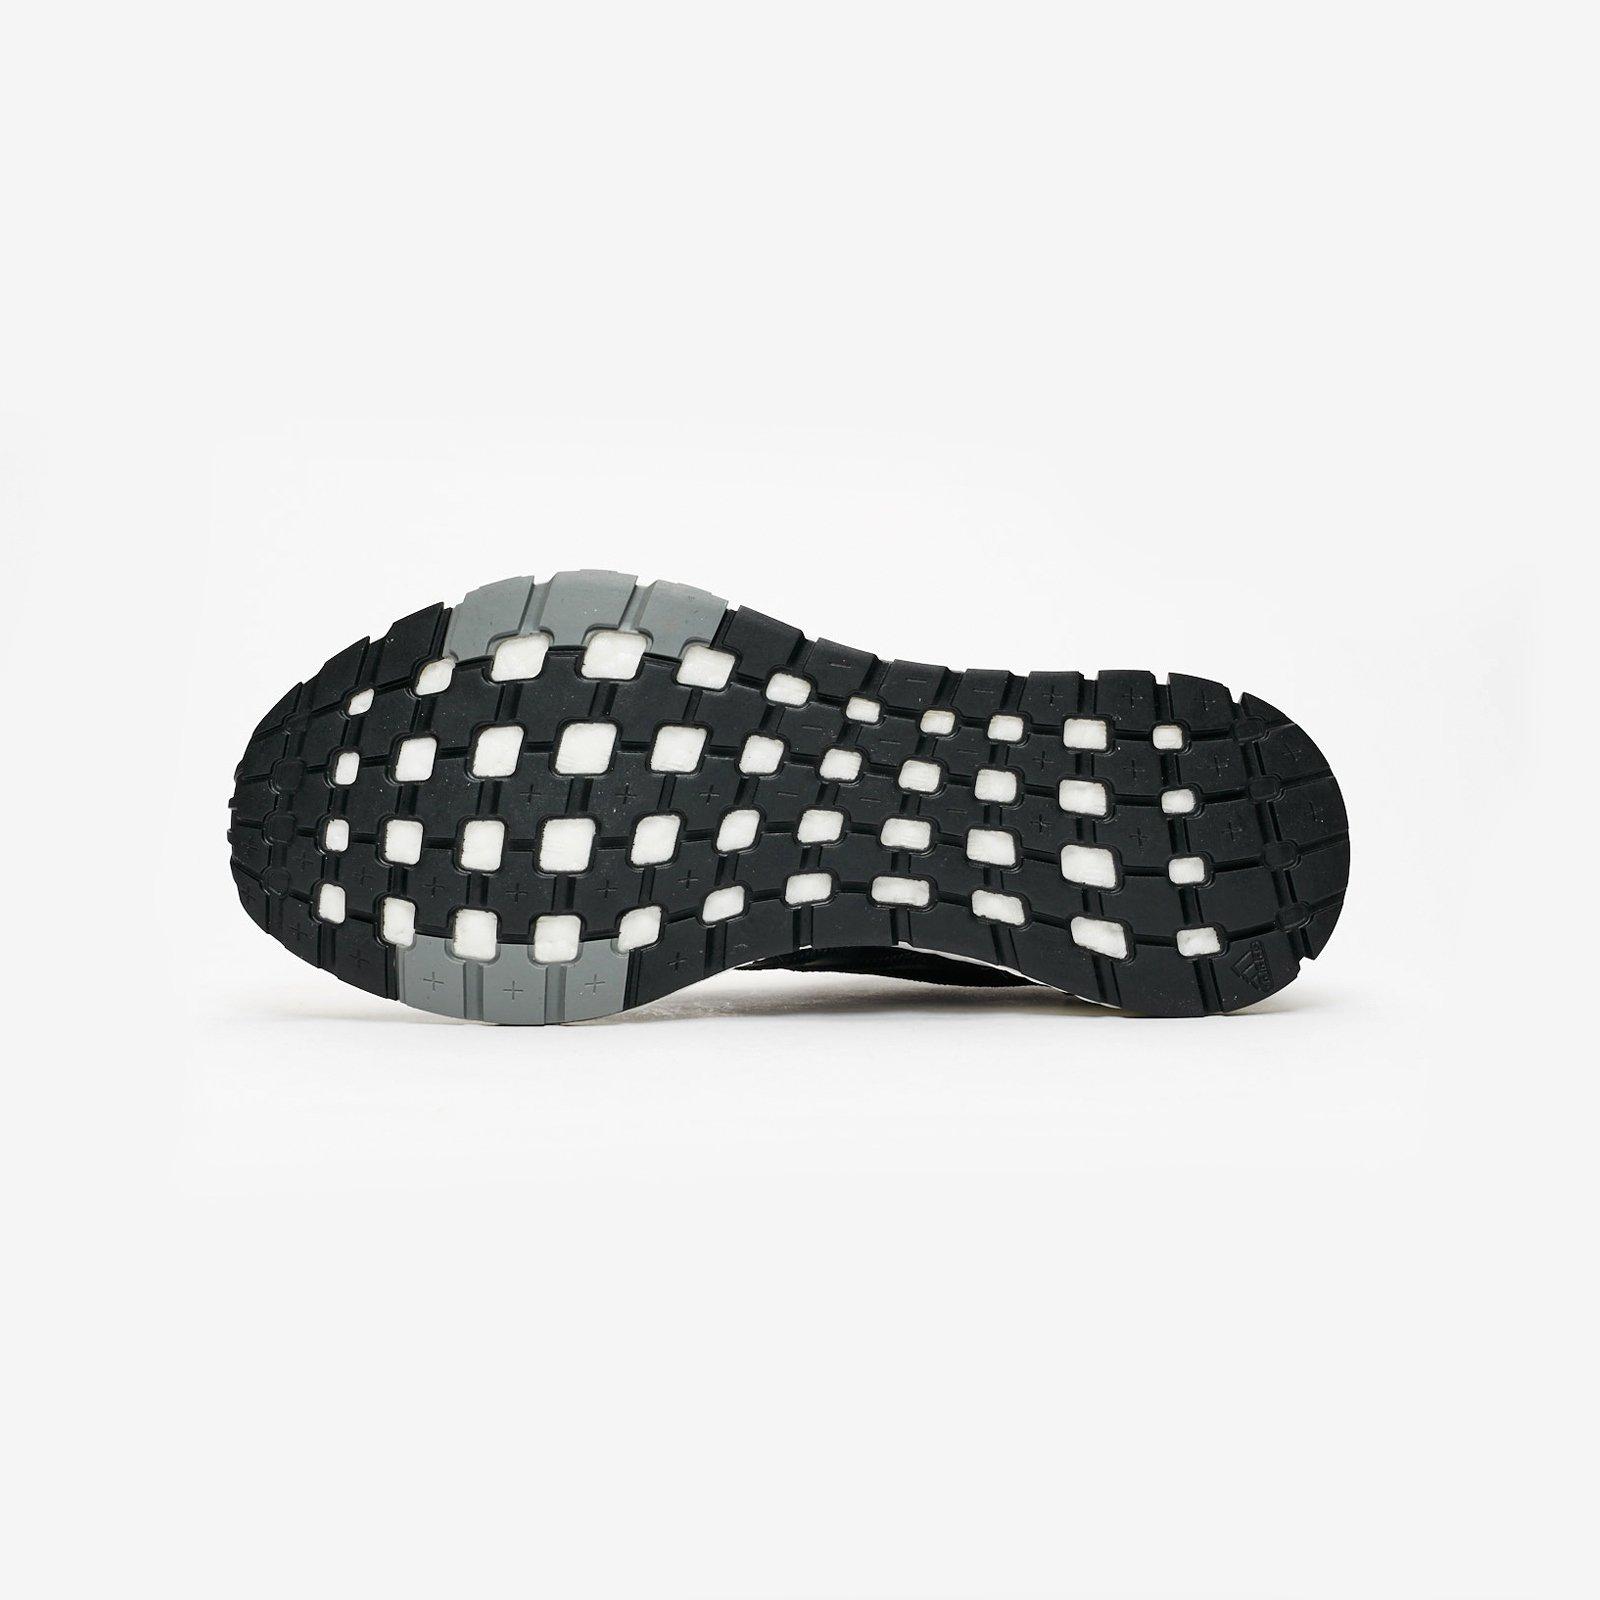 7bbff377a82de1 adidas PureBOOST RBL x UNDFTD - Bc0473 - Sneakersnstuff